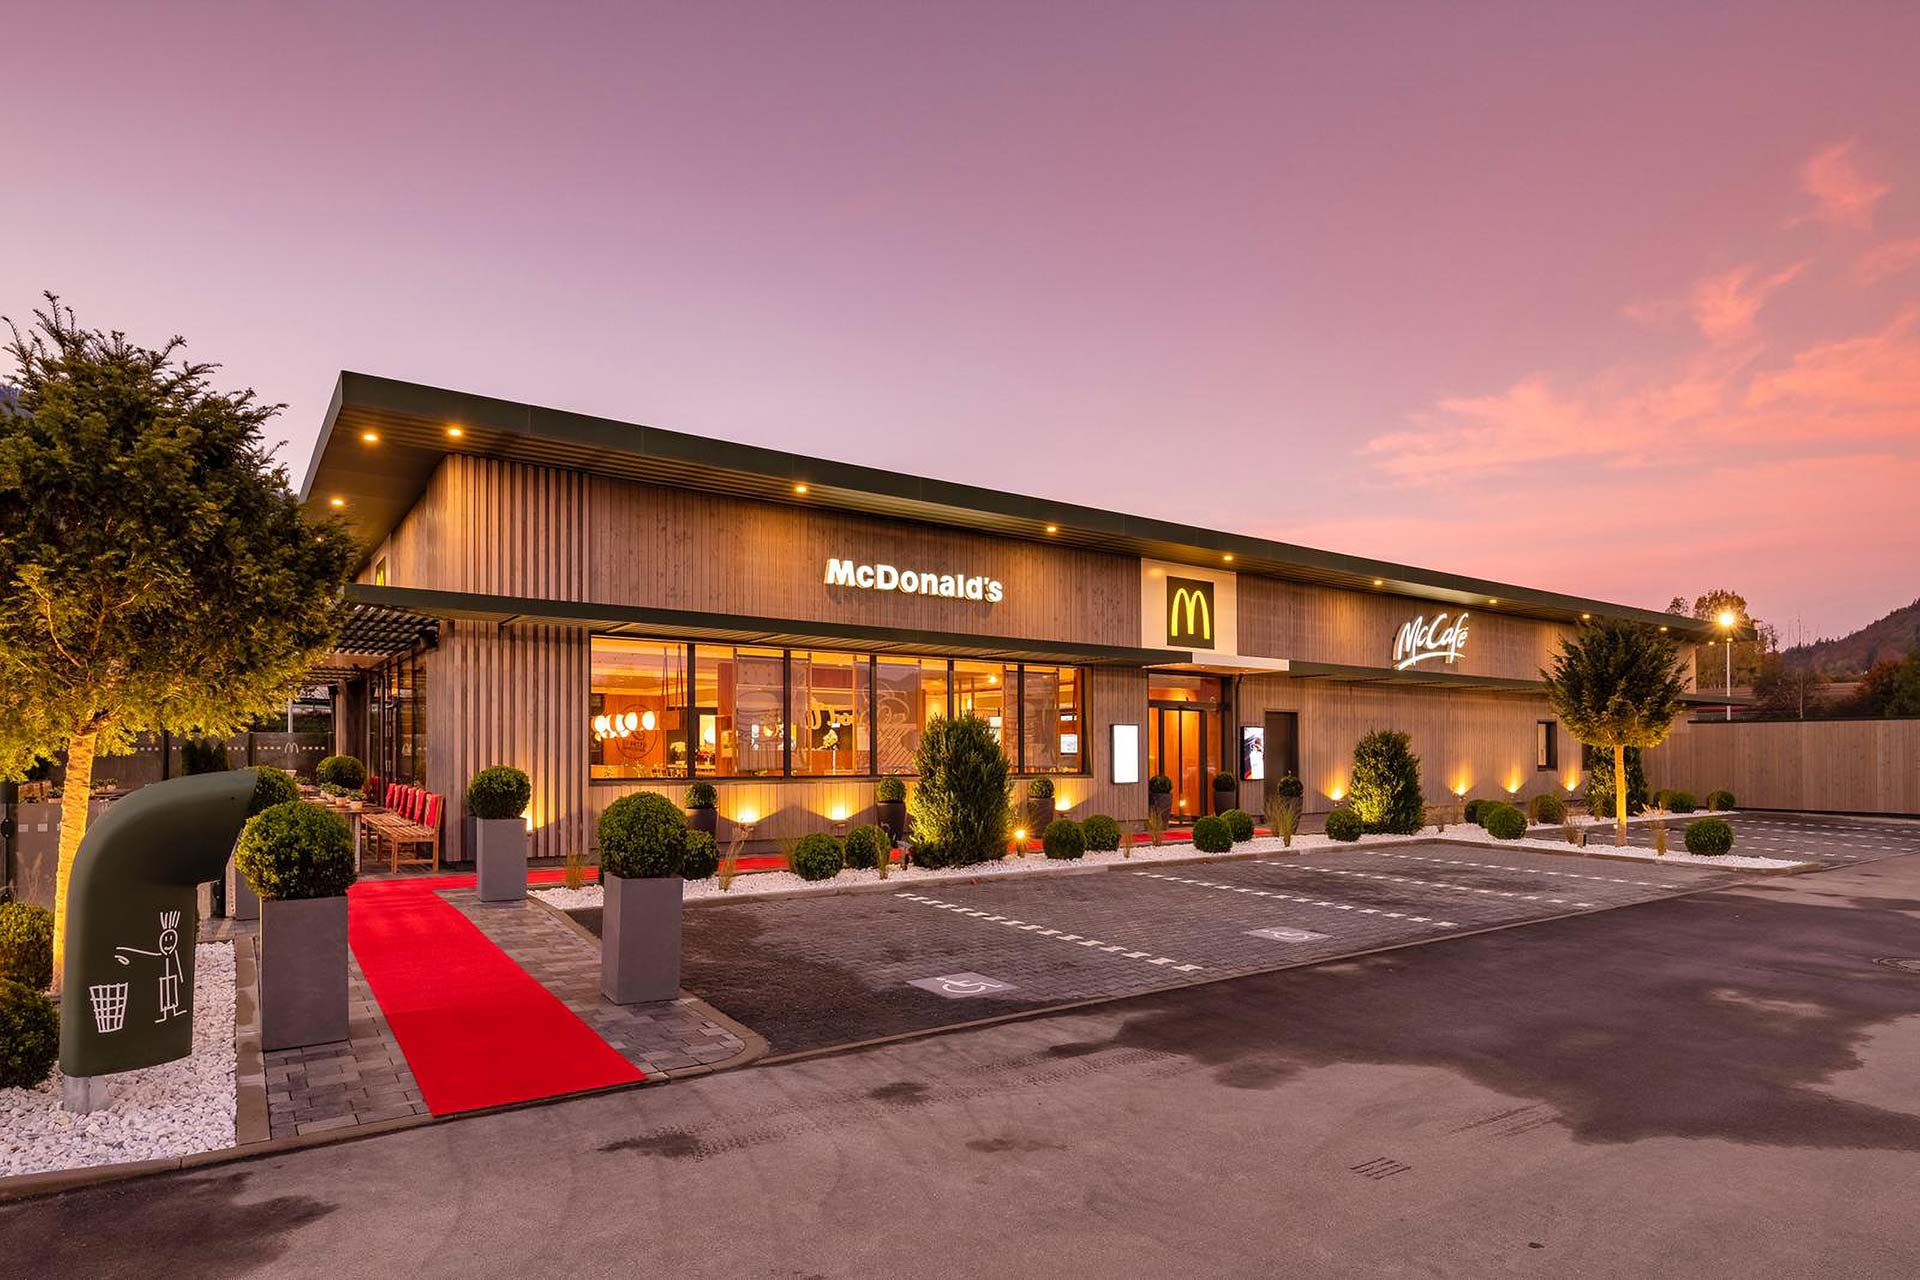 Alusysteme - Metallbau Bellmann GmbH: McDonald's in Kiefersfelden